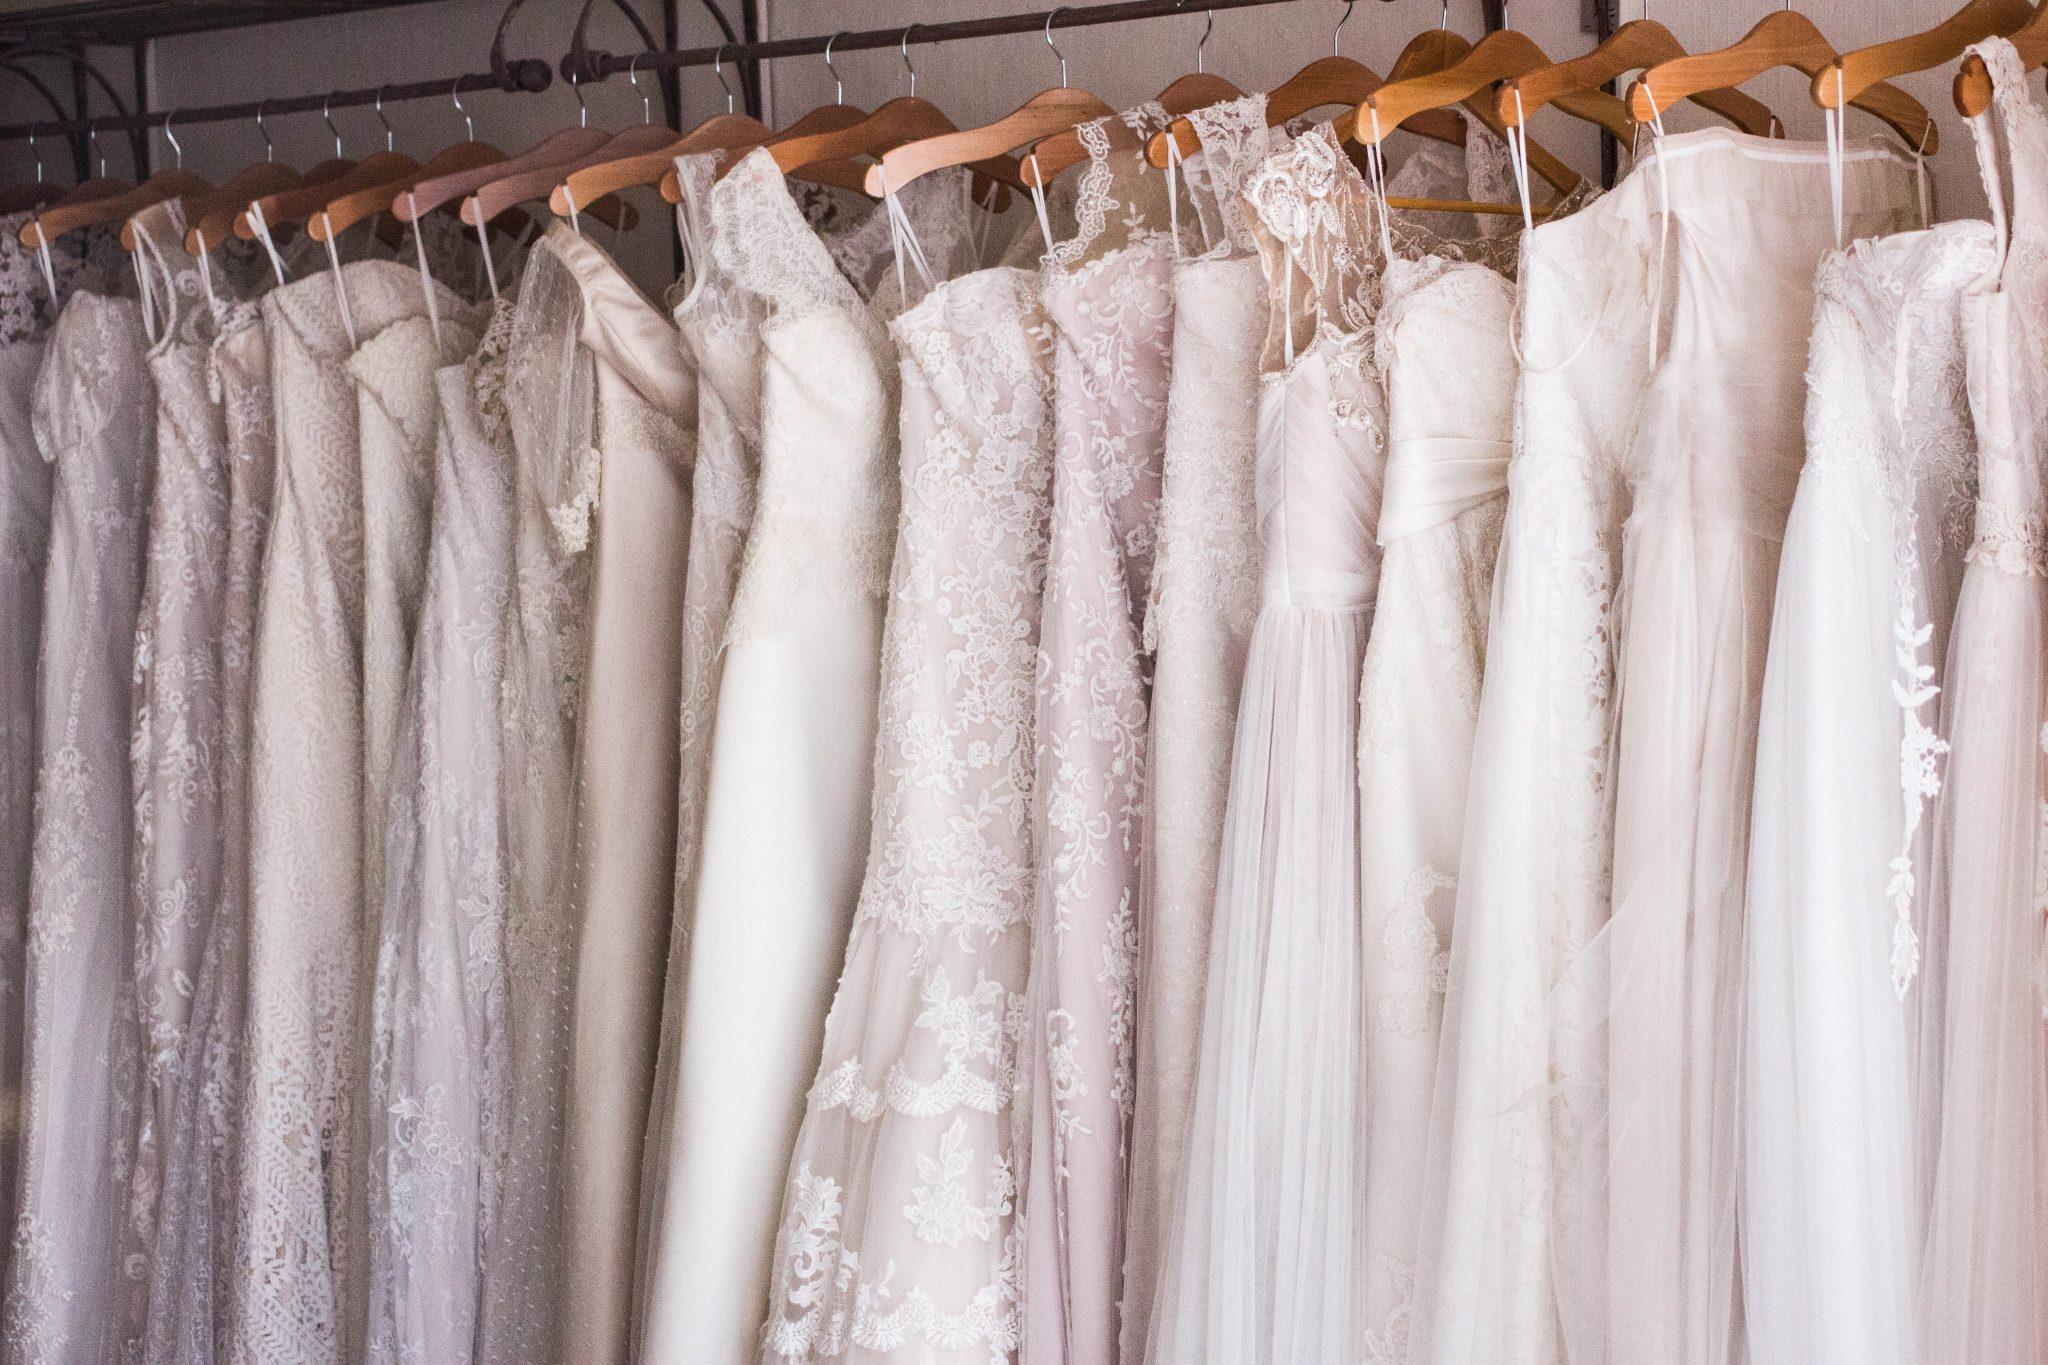 Wedding Dresses Hanging on a Rack